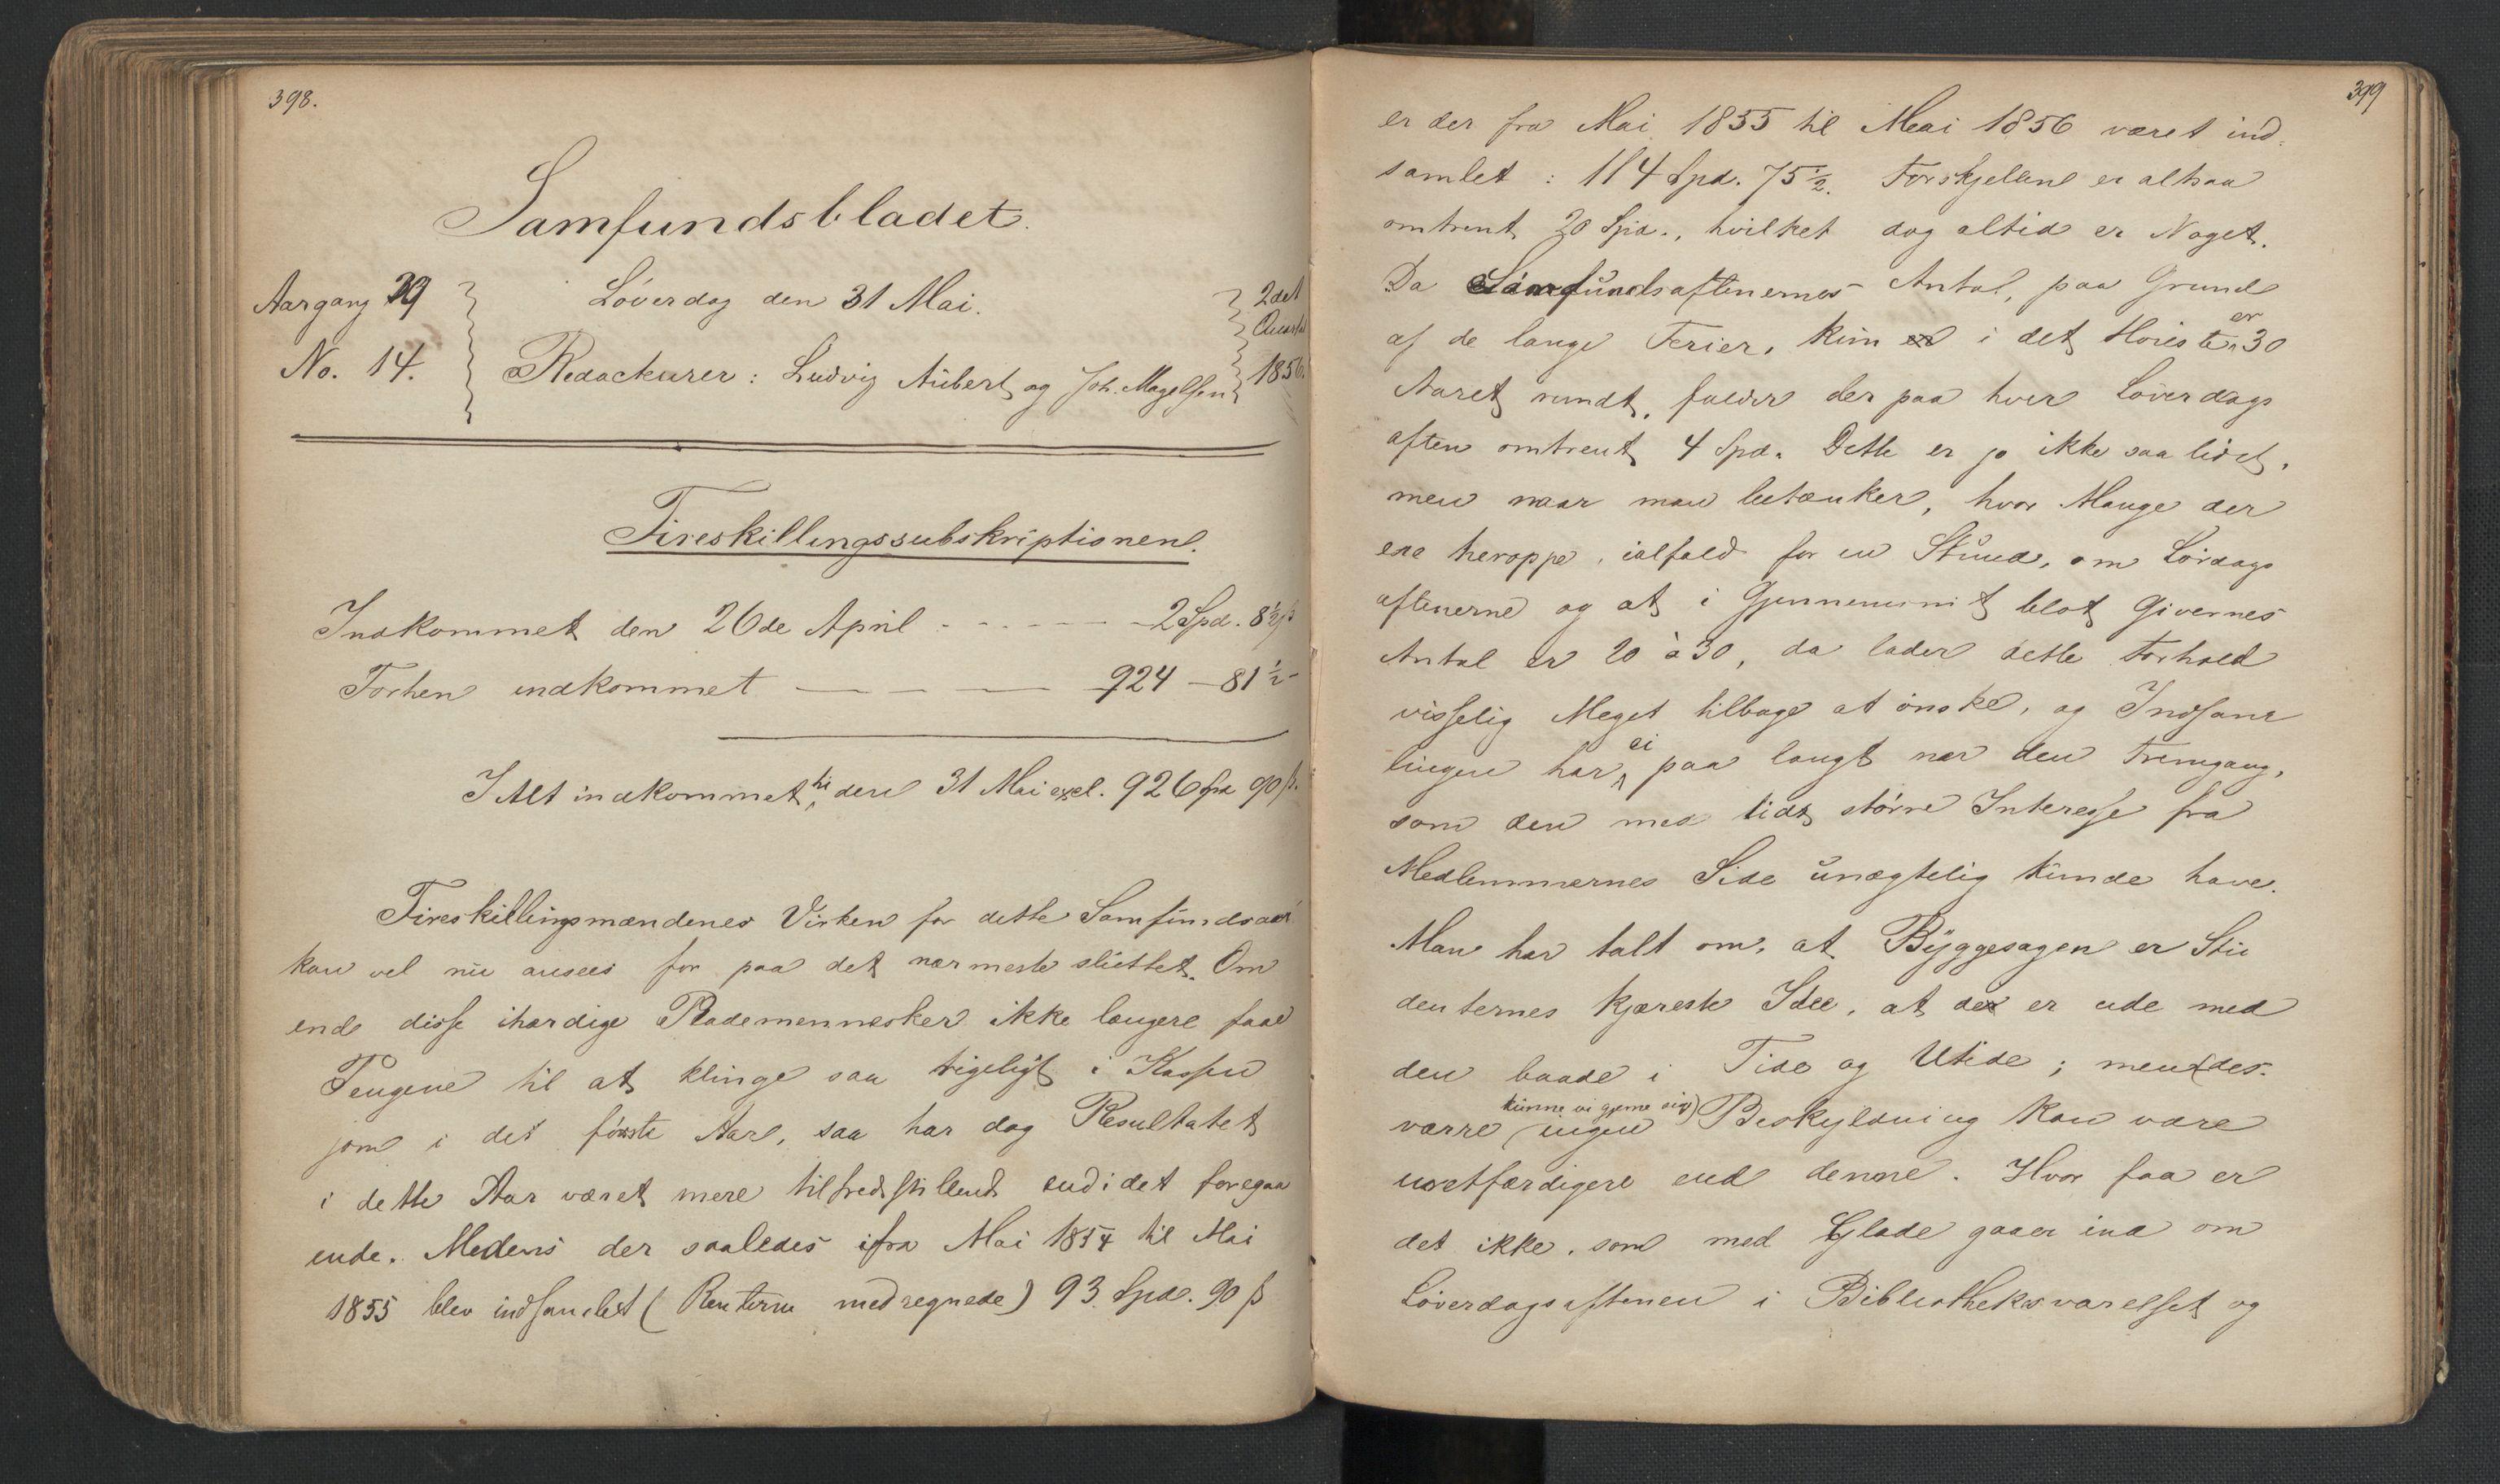 RA, Det Norske Studentersamfund, X/Xa/L0005, 1855-1856, s. 202